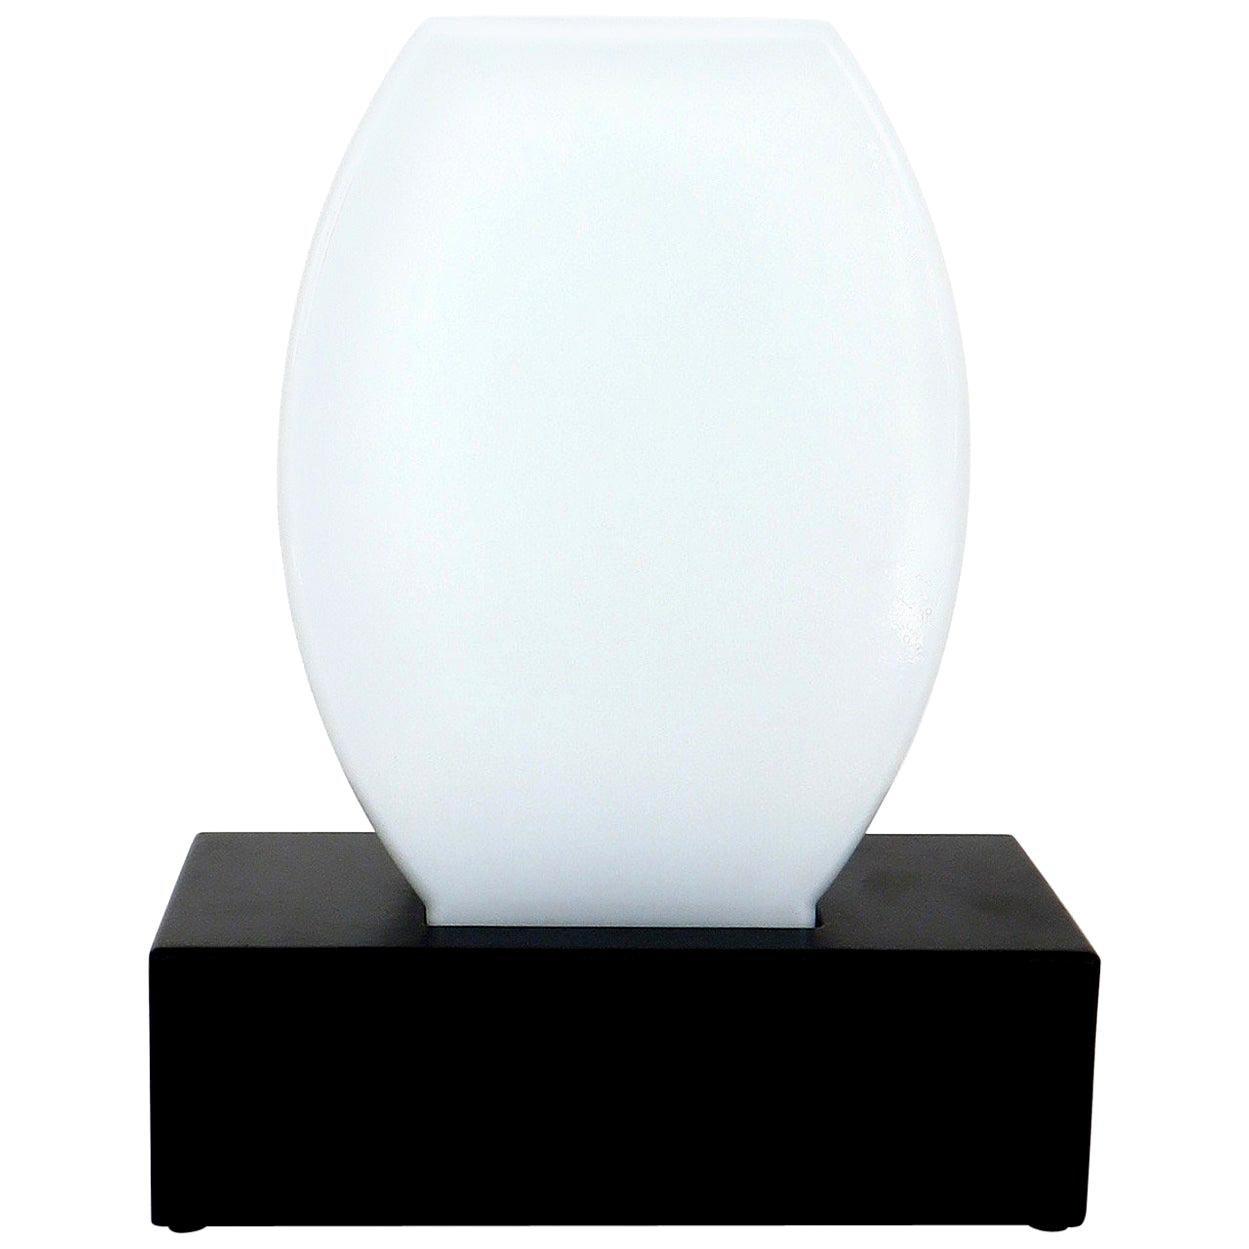 Ettore Sottsass for Stillovo Murano Glass Table Lamp Dorane Black Opaque Glass